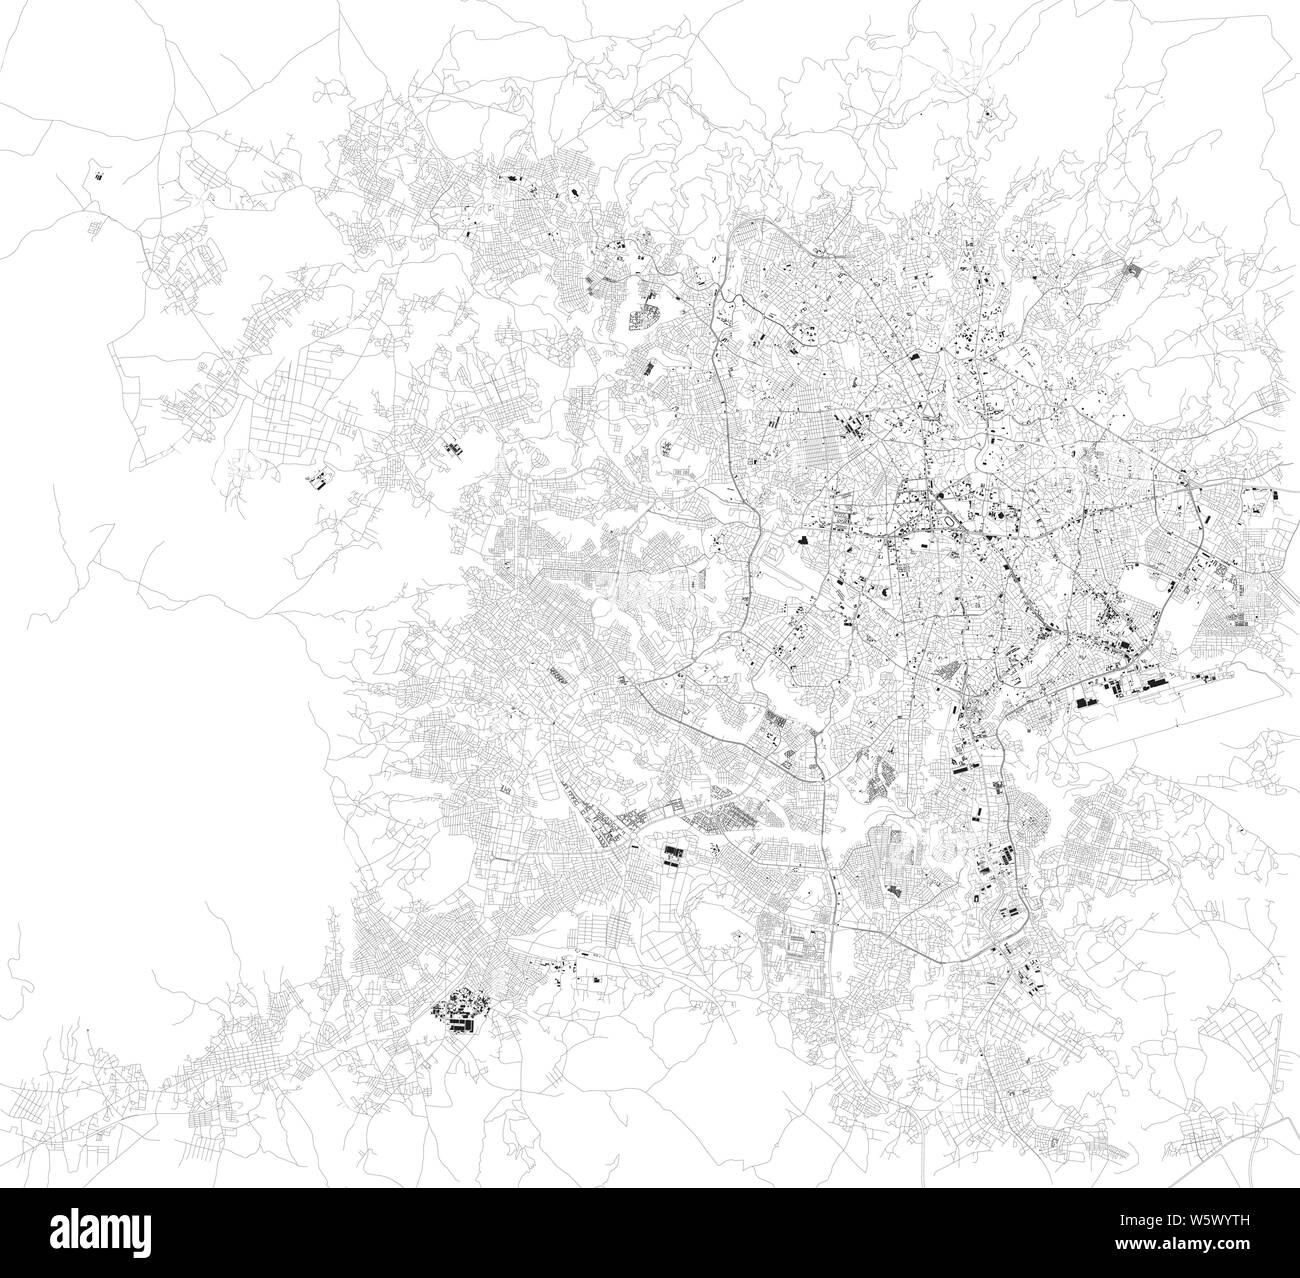 Capital Of Ethiopia Black and White Stock Photos & Images ... on capital of qatar map, capital of estonia map, capital of benin map, capital of suriname map, capital of bosnia map, capital of latvia map, capital of azerbaijan map, capital of ghana map, capital of burma map, capital of malawi map, capital of bermuda map, capital of united arab emirates map, capital of luxembourg map, capital of montenegro map, capital of kosovo map, capital of guyana map, capital of dominica map, capital of the united kingdom map, capital of gambia map, capital of macedonia map,